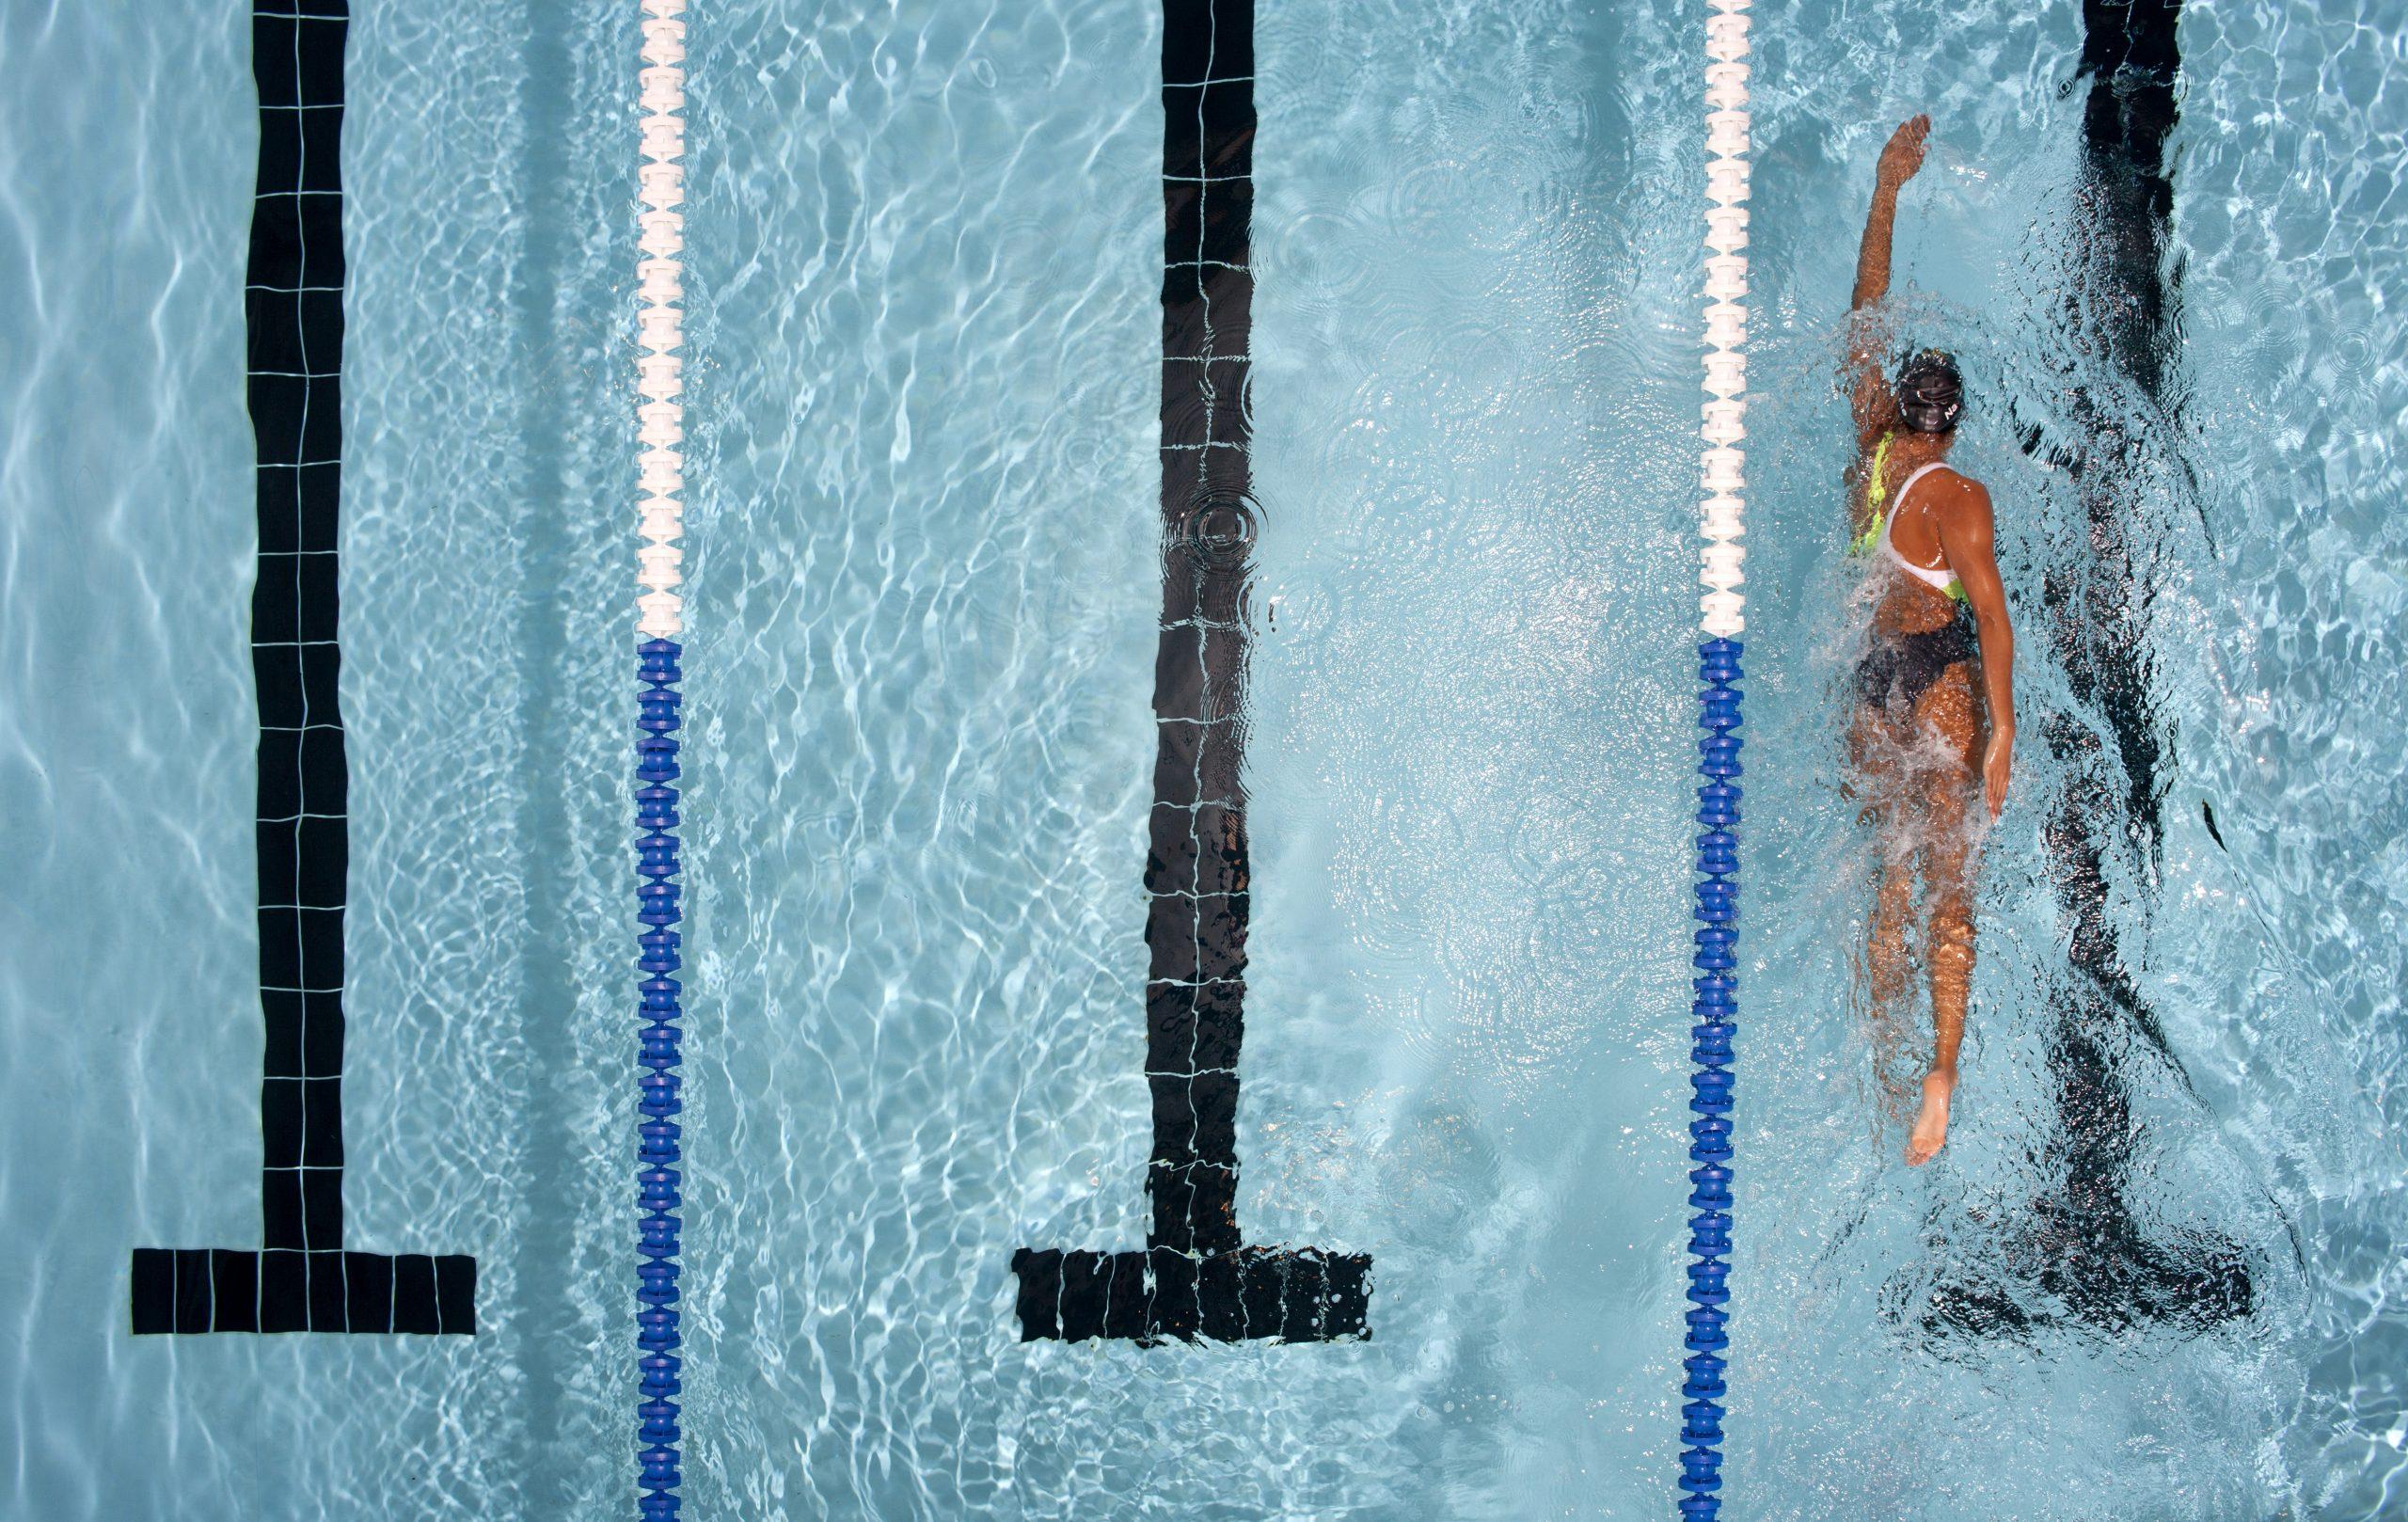 nageuse en plein effort